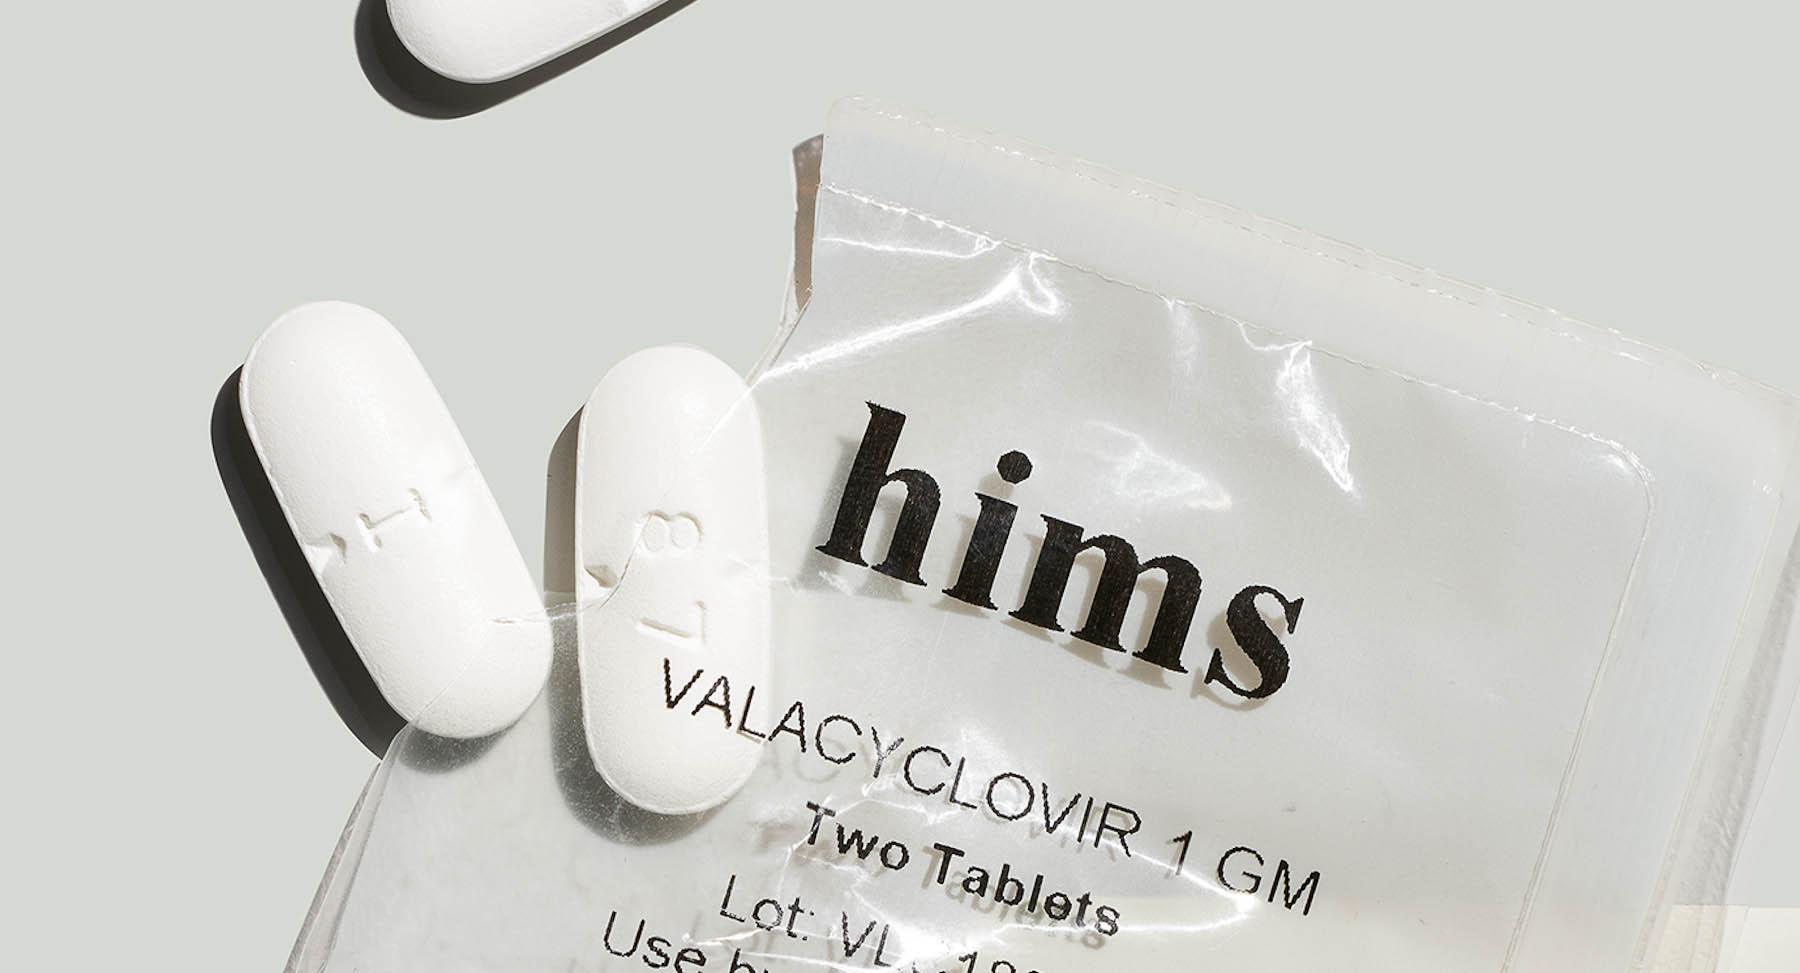 Valacyclovir Dosage Guide: Cold Sores, Genital Herpes & More